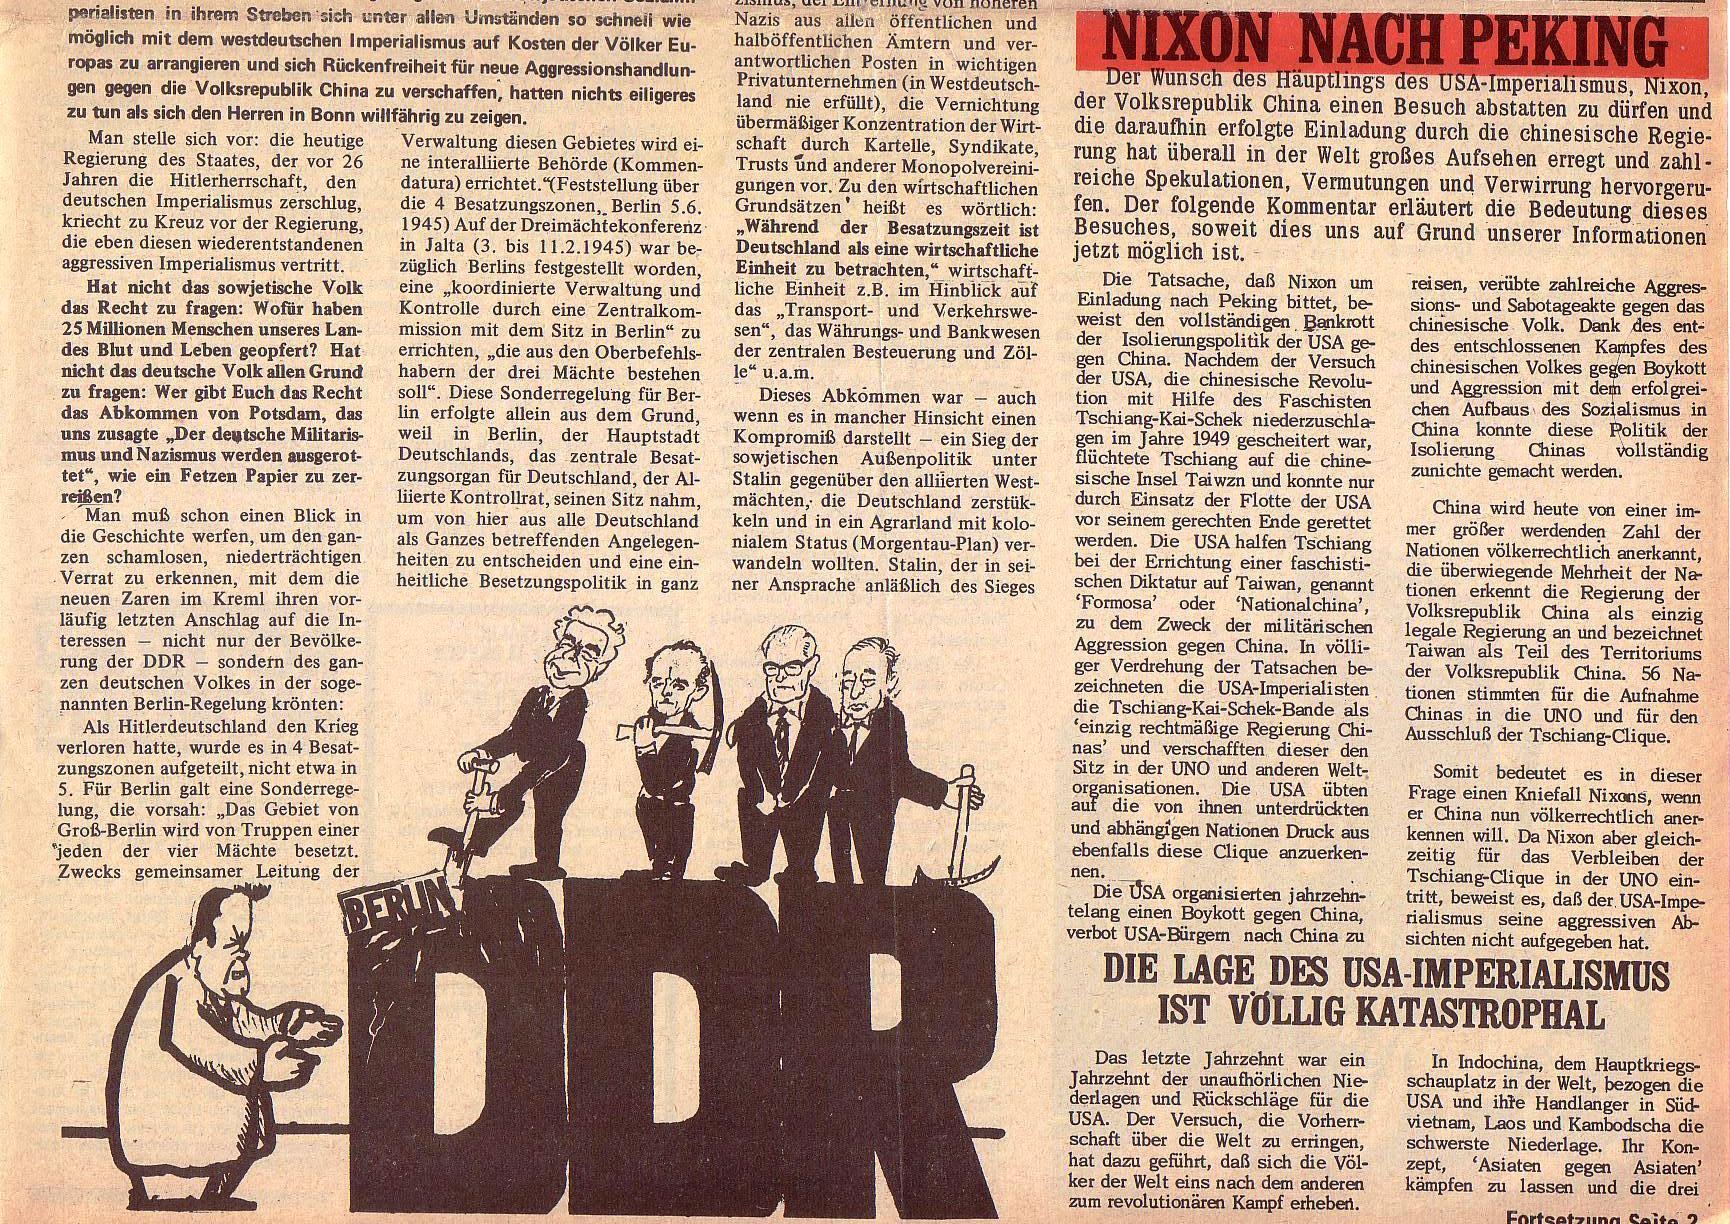 Roter Morgen, 5. Jg., 13. September 1971, Nr. 9, Seite 1b